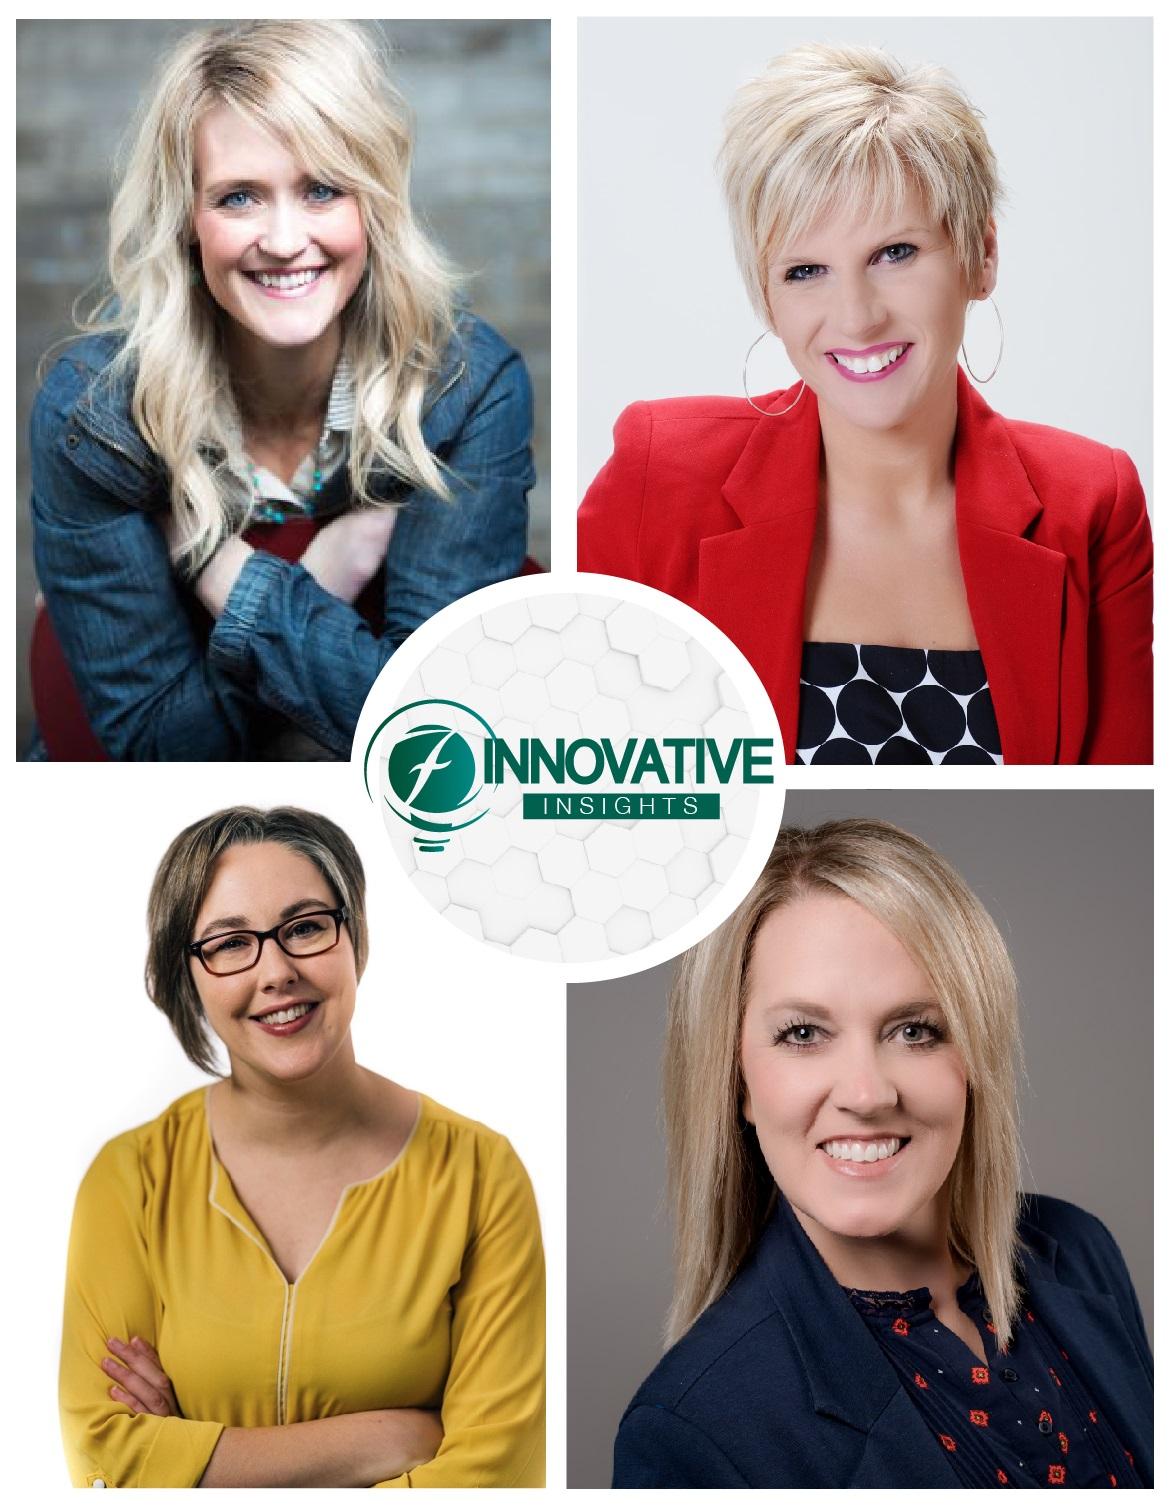 Innovative Insights Zeal Center